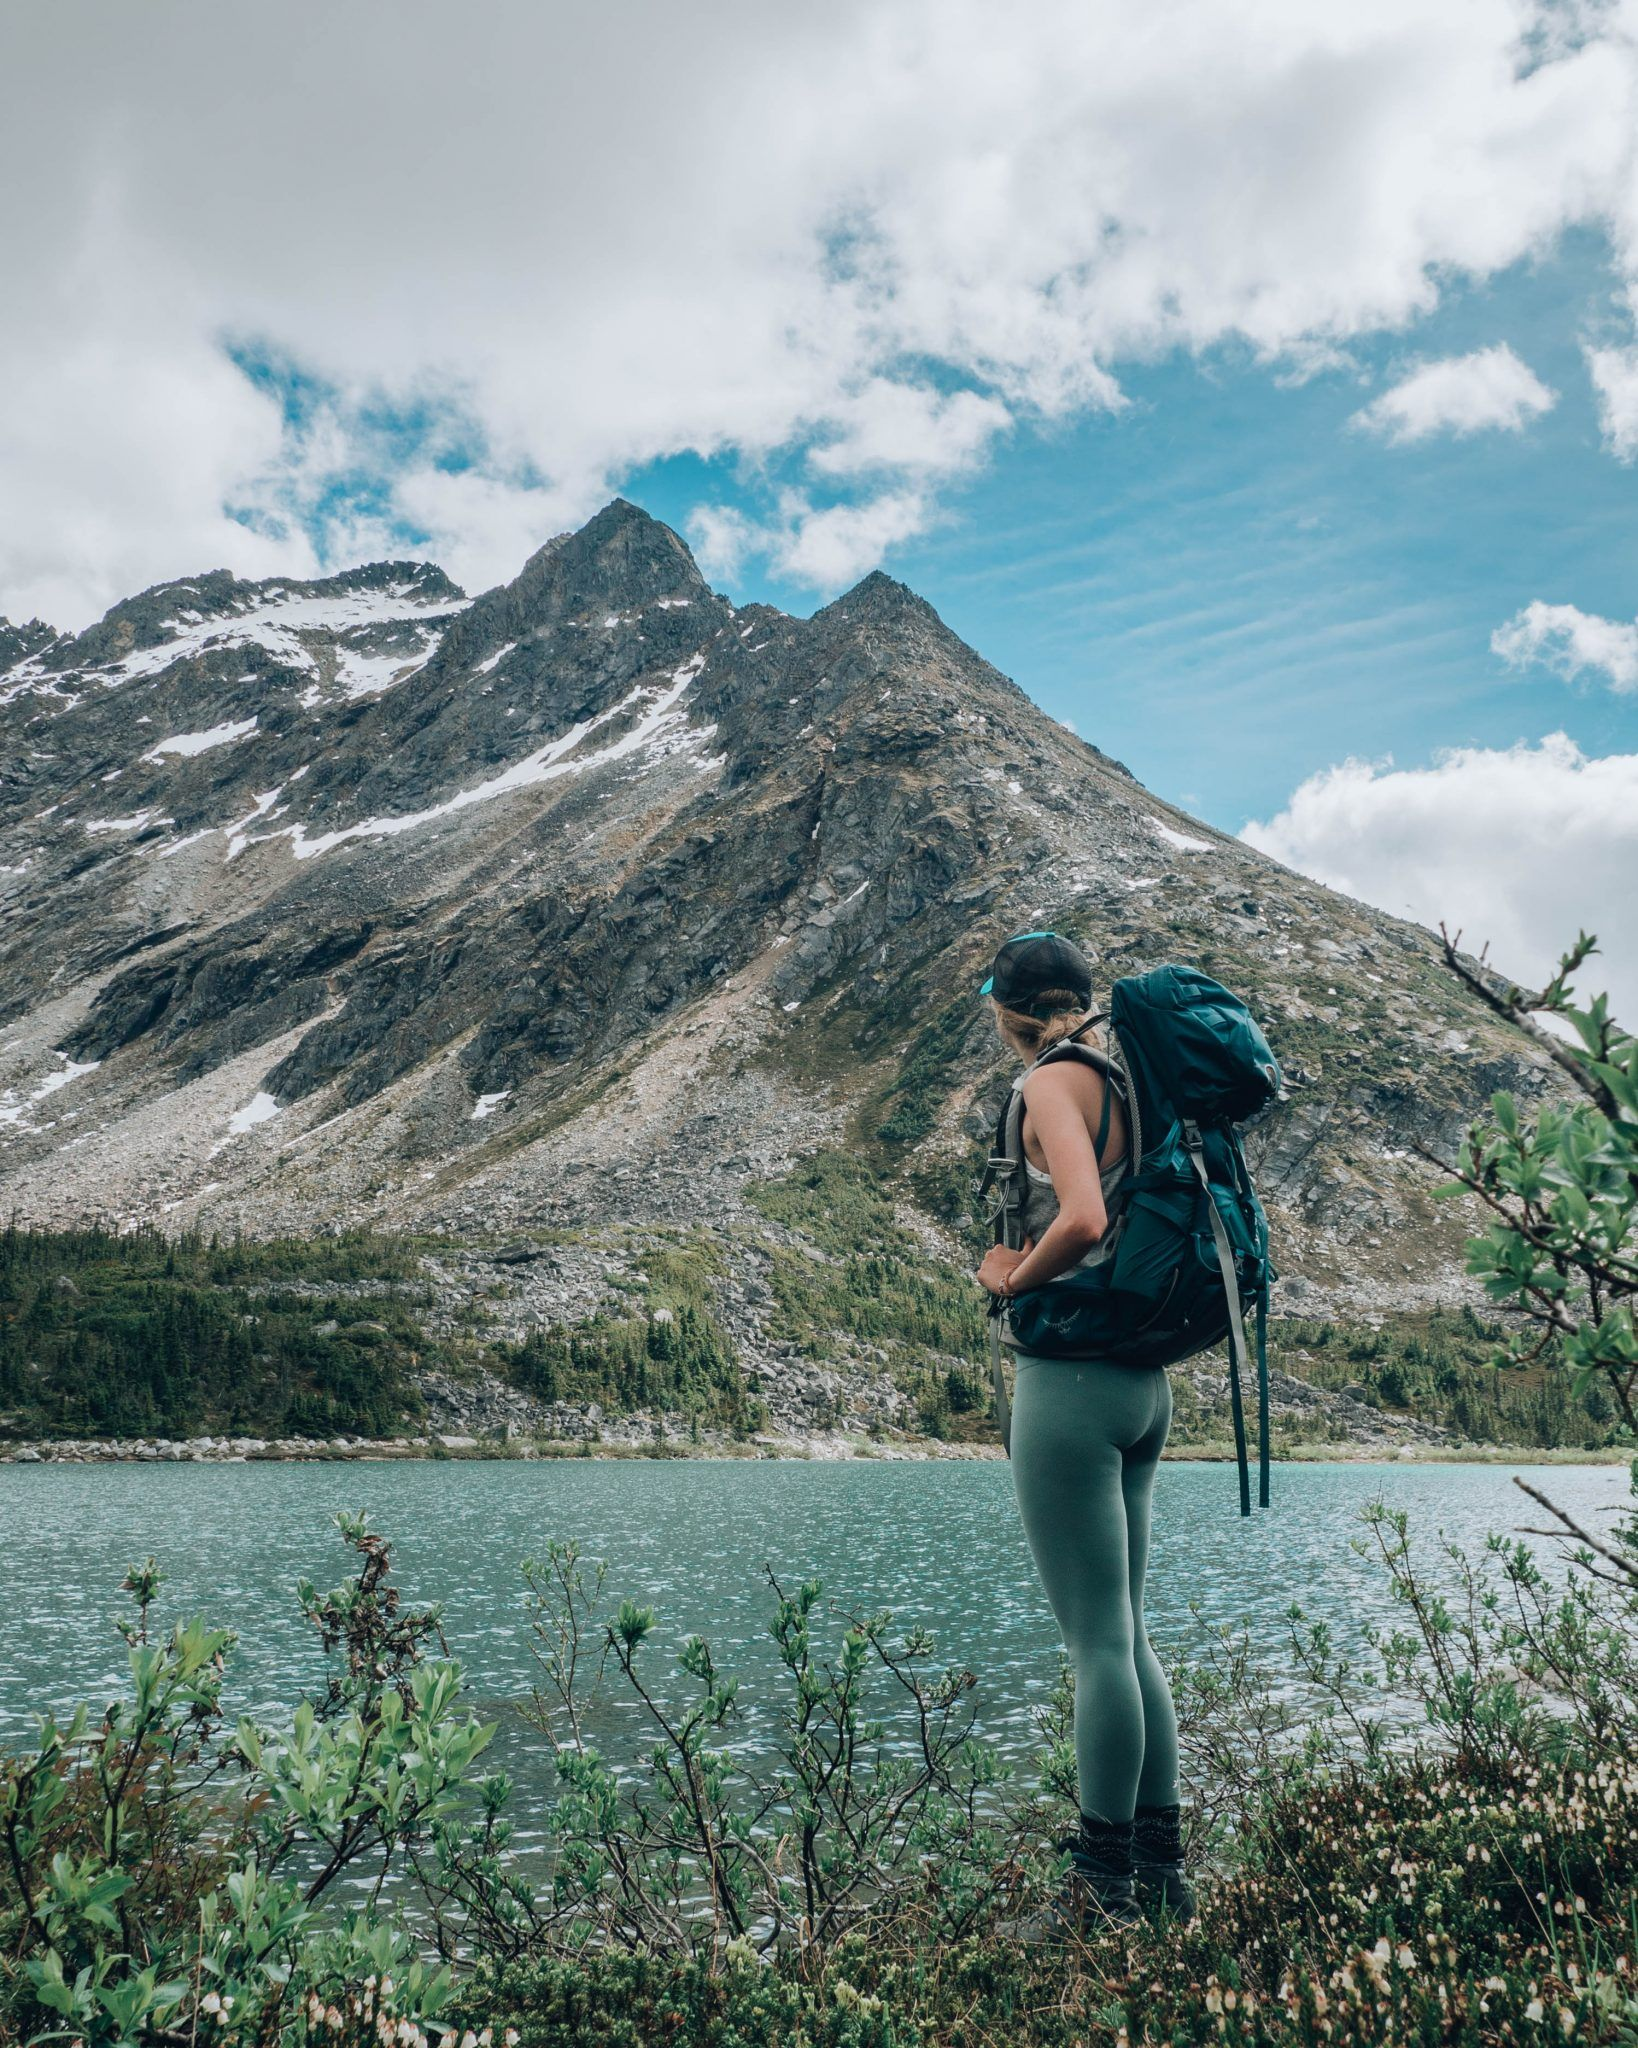 Hike With Me: Upper Dewey Lake, Skagway, Alaska (With